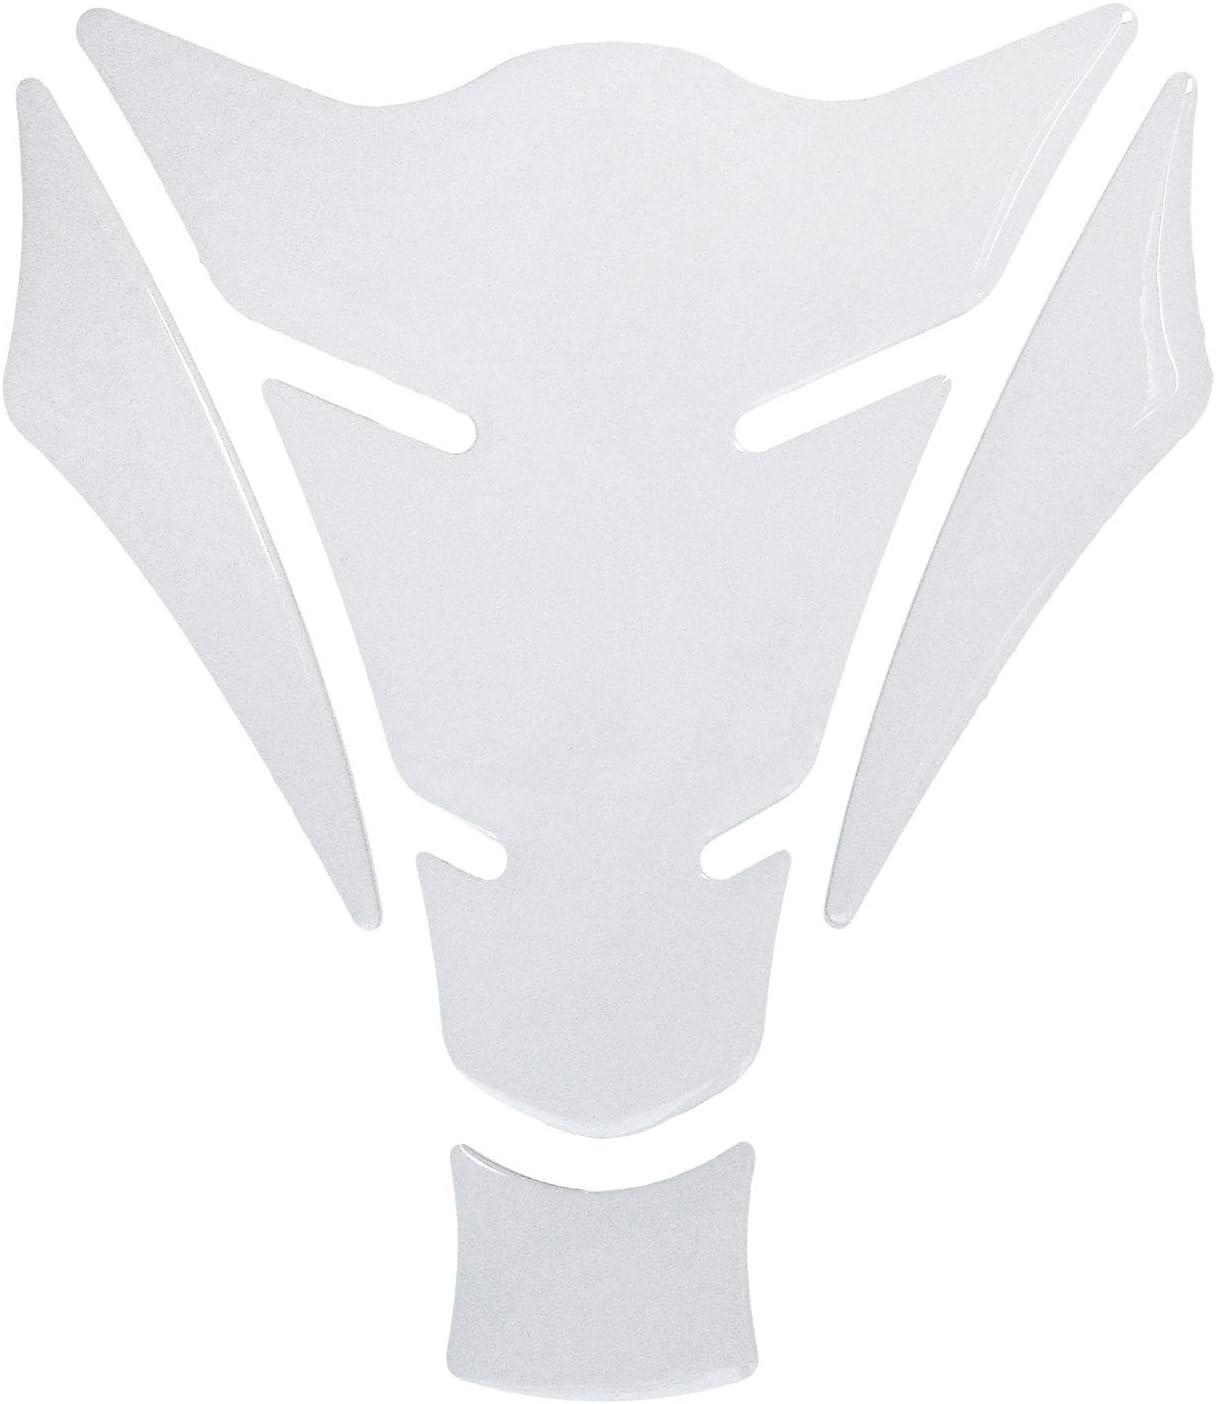 BIKE-label 501340-VA Tankpad Motorrad Aufkleber Wei/ß White